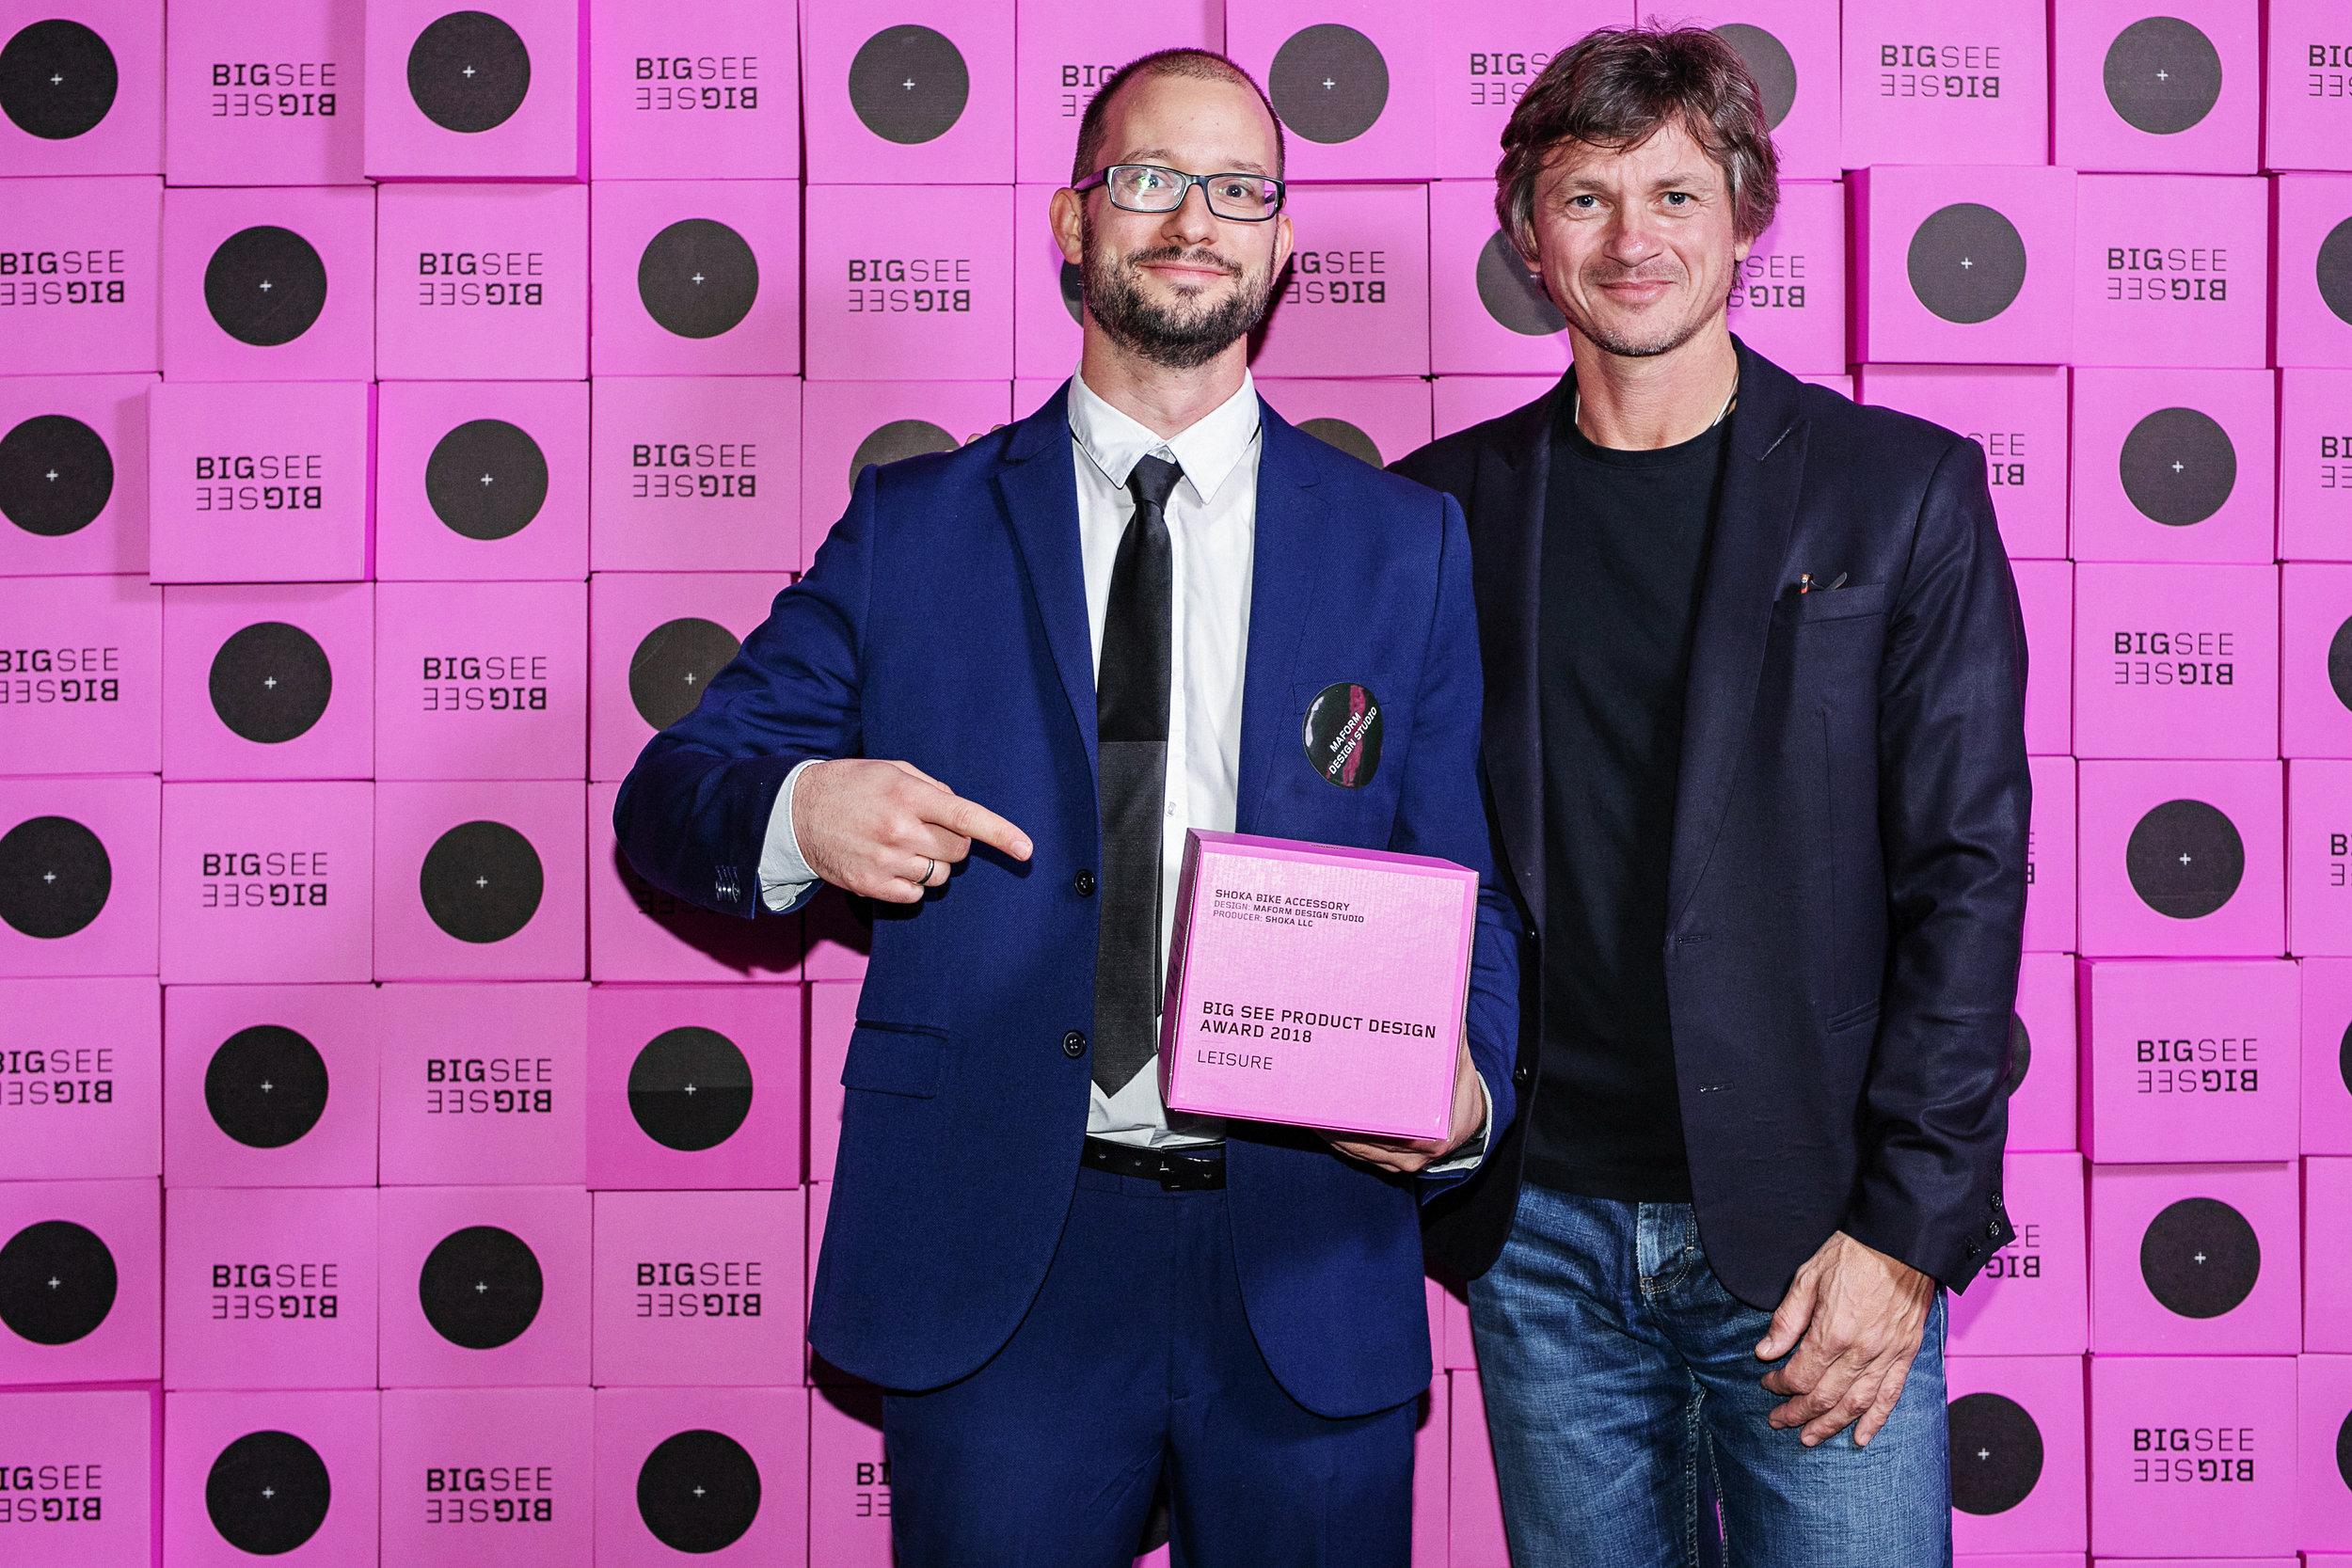 Award photo with BIG SEE lead curator Zmago Novak and maform CEO Peter Molnar – Photo credit: Miloš Horvat